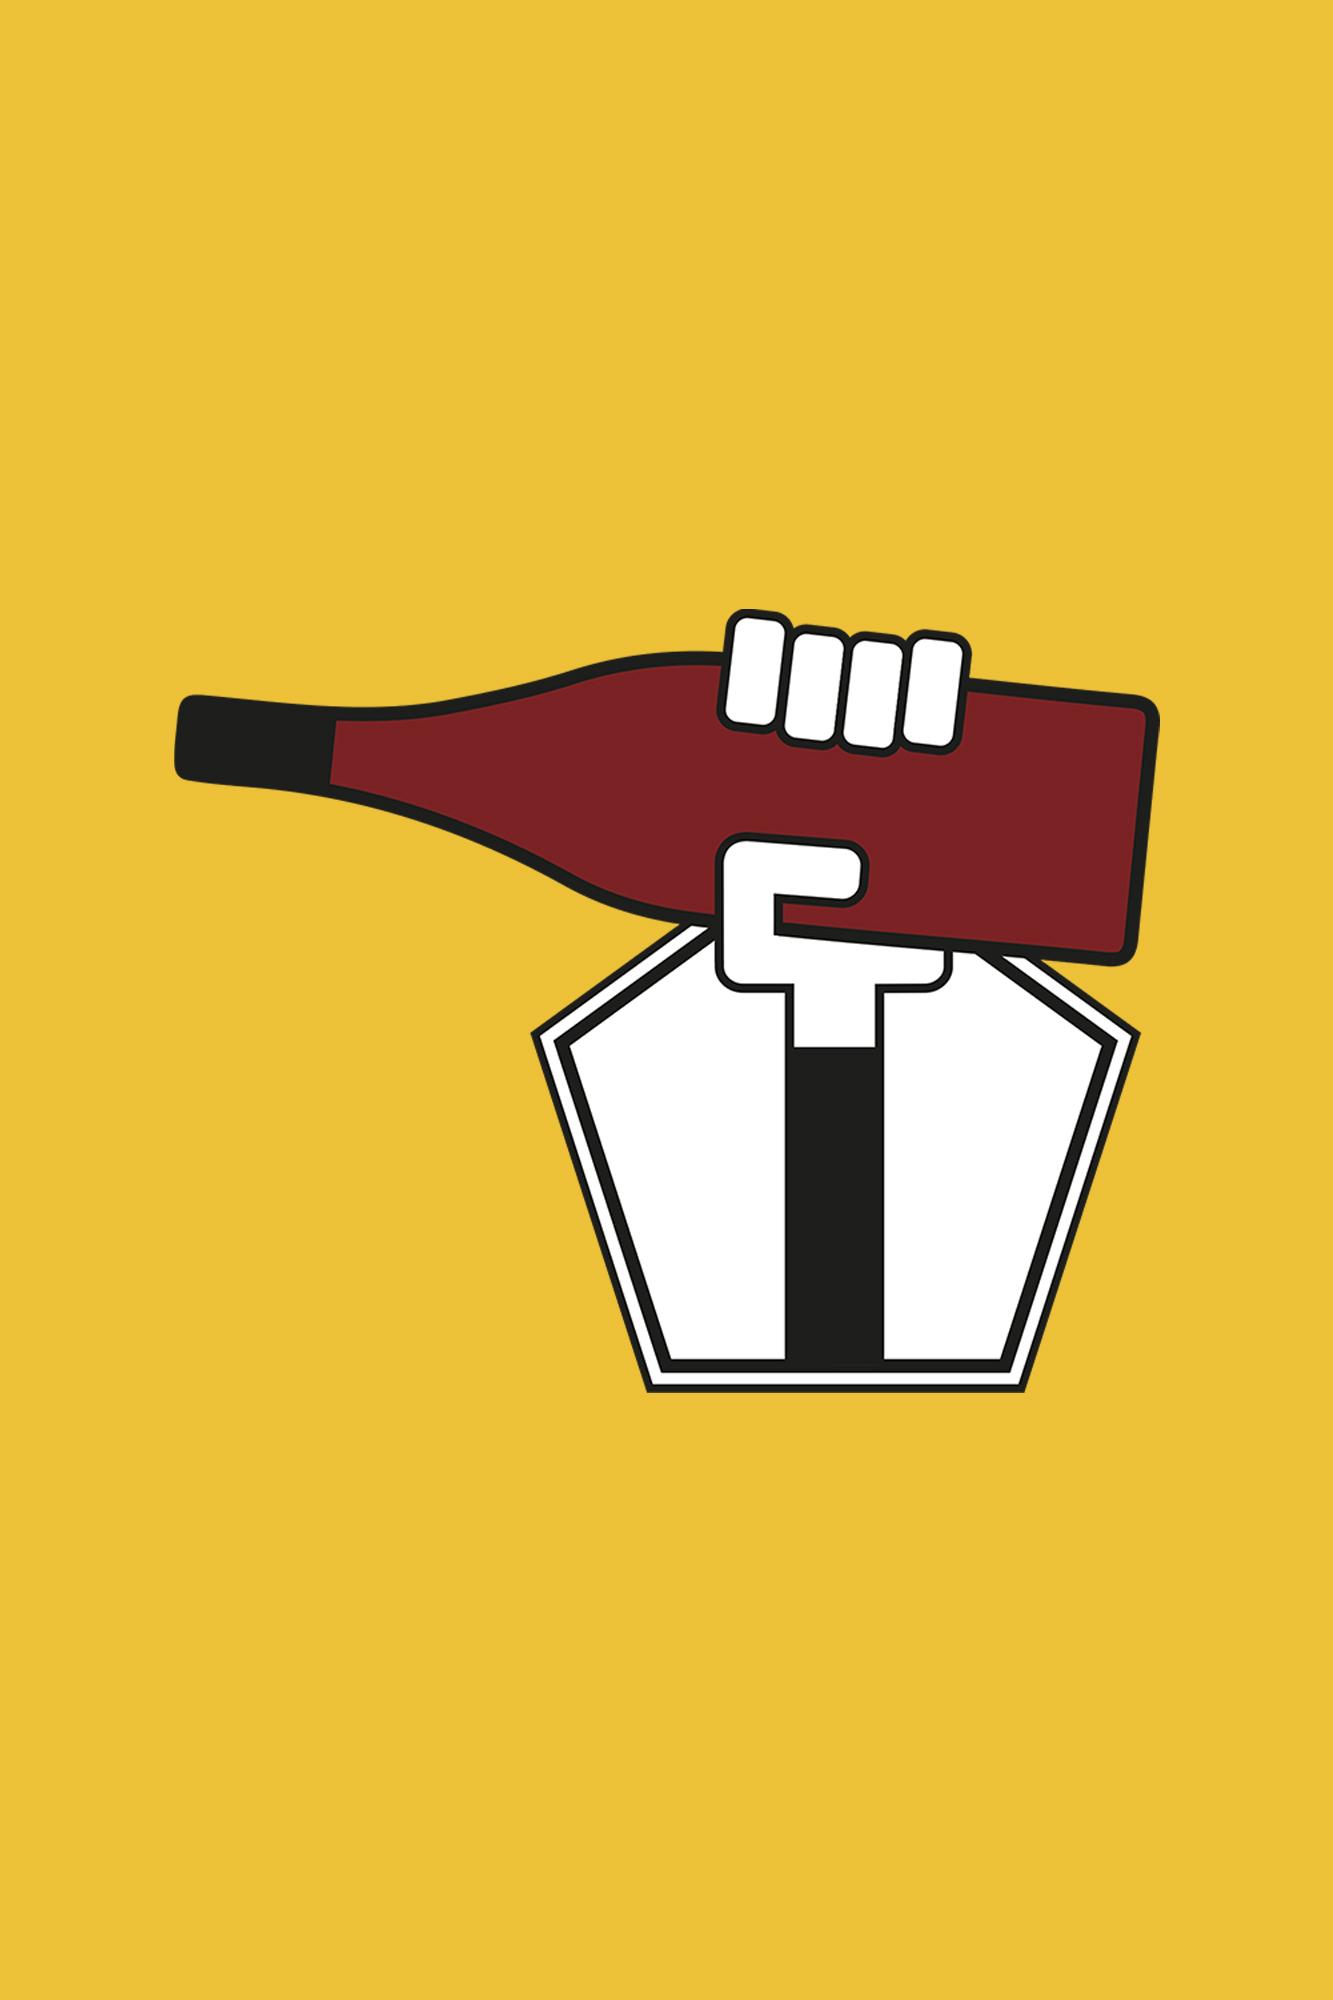 bourgogne bouteille homme bocavi Tshirt vin